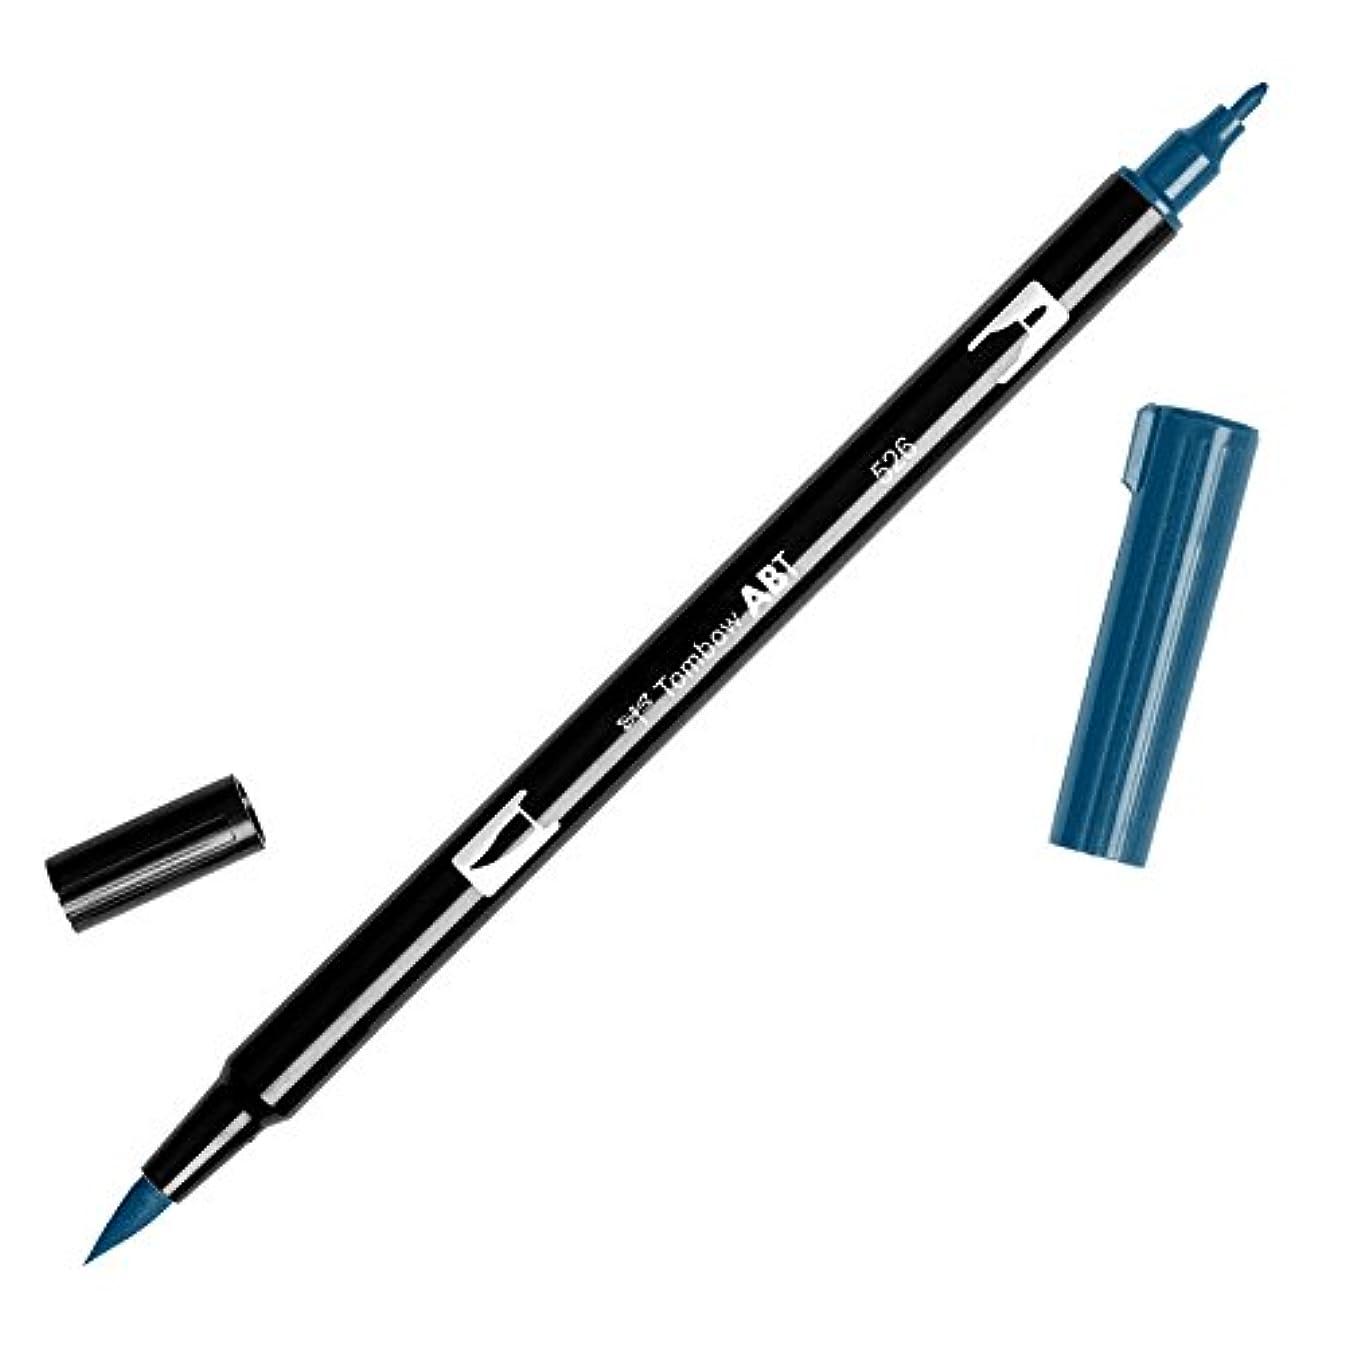 Tombow Dual Brush Pen Art Marker, 526 - True Blue, 1-Pack